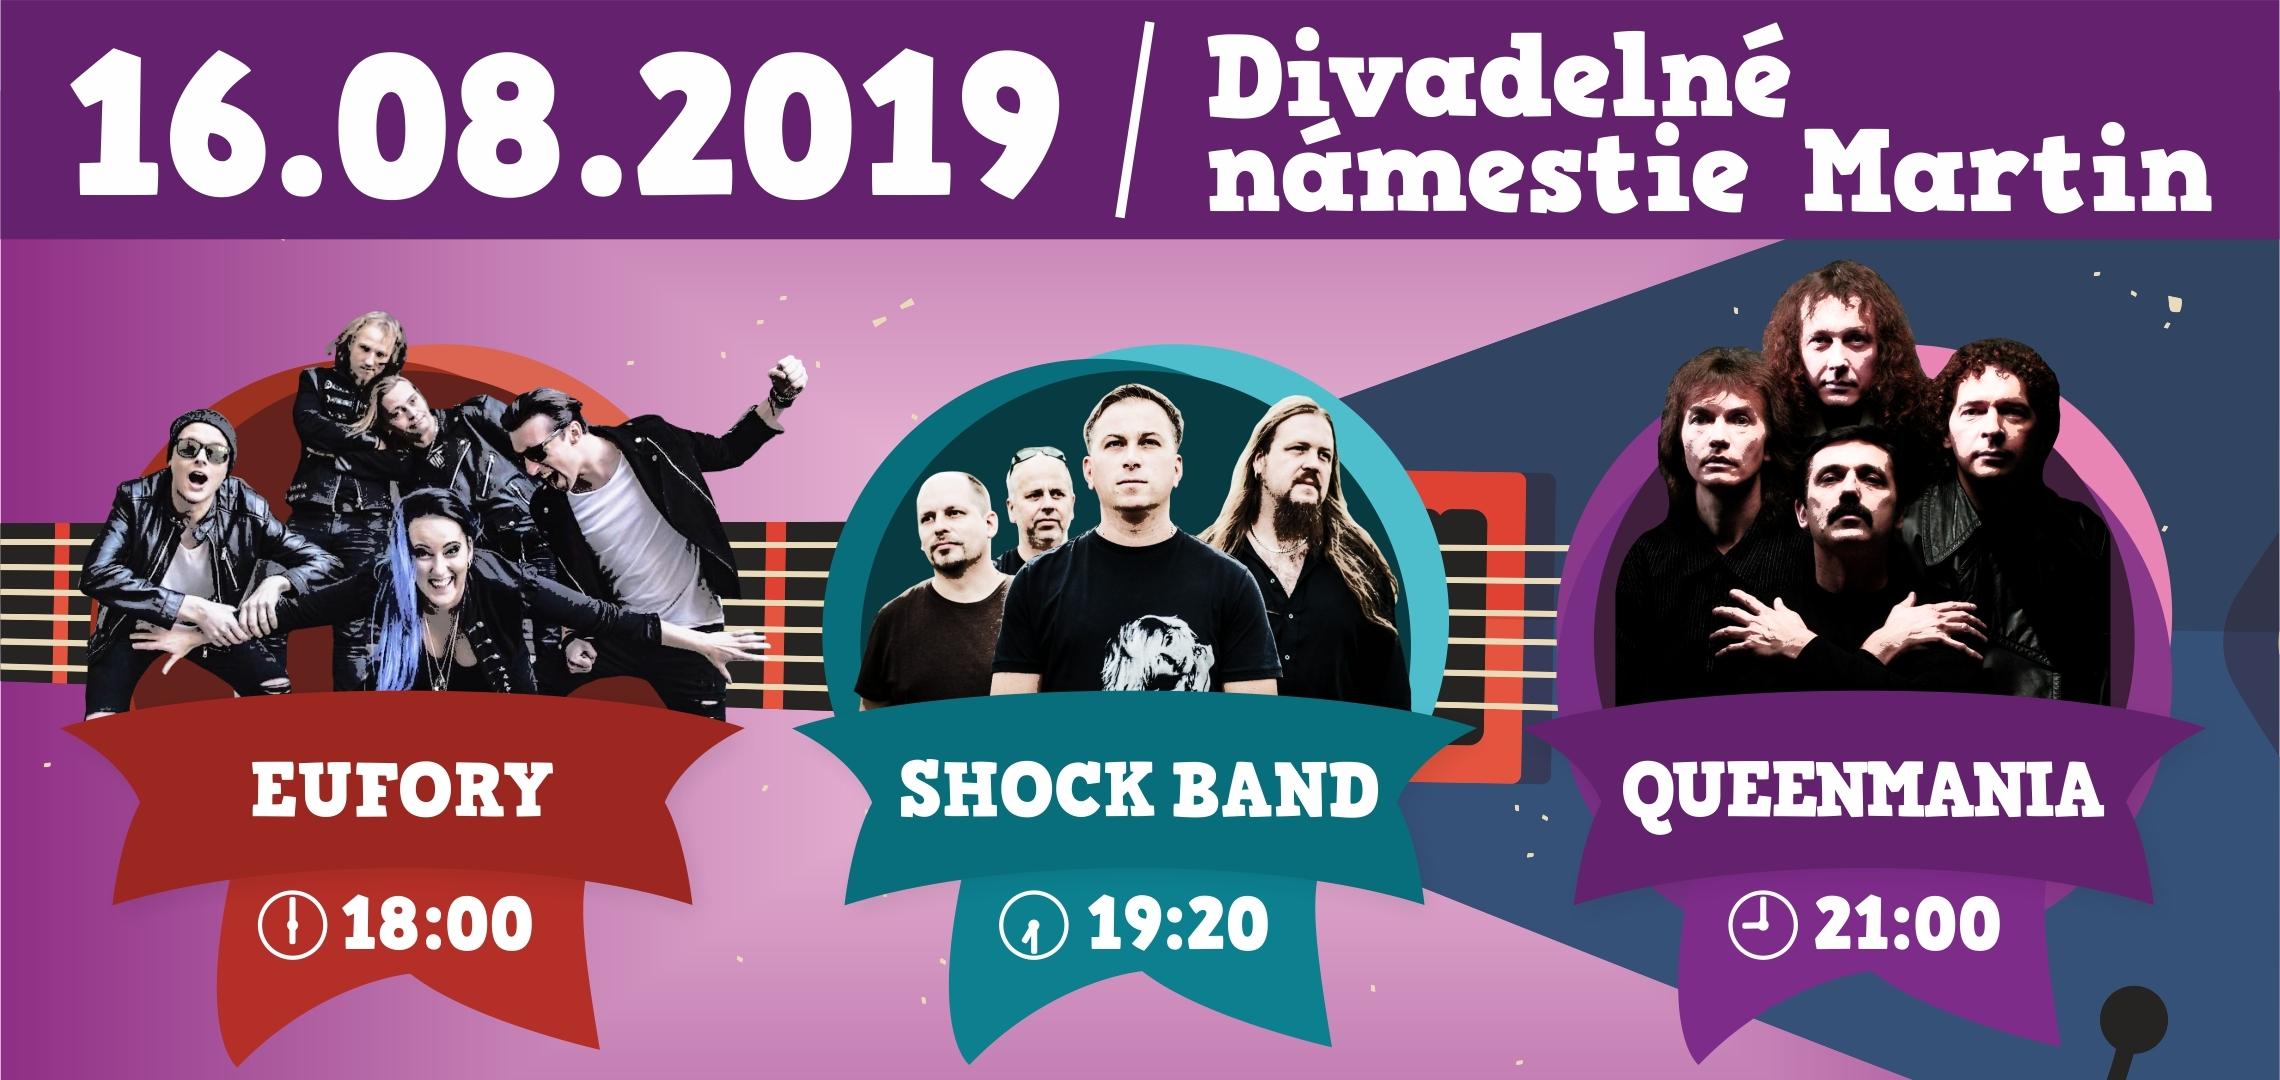 Eufory, Shock Band, Queenmania